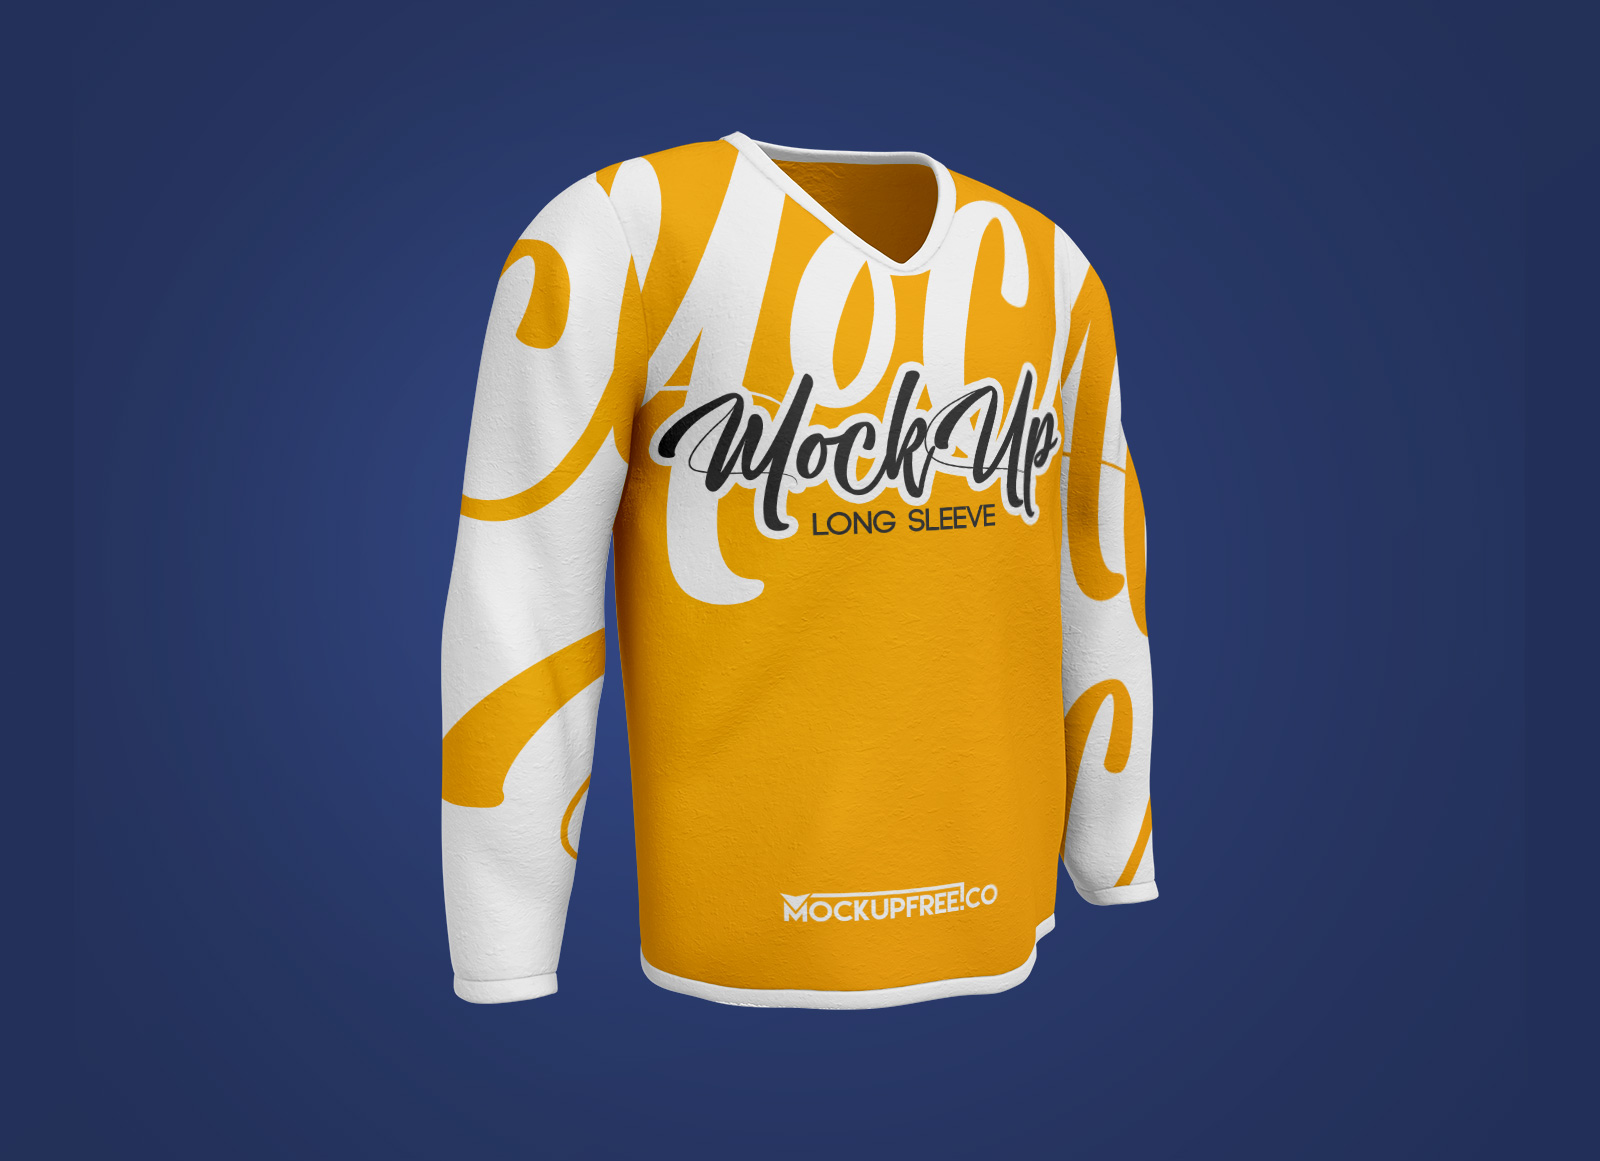 Free-V-Neck-Full-Sleeves-T-Shirt-Mockup-PSD